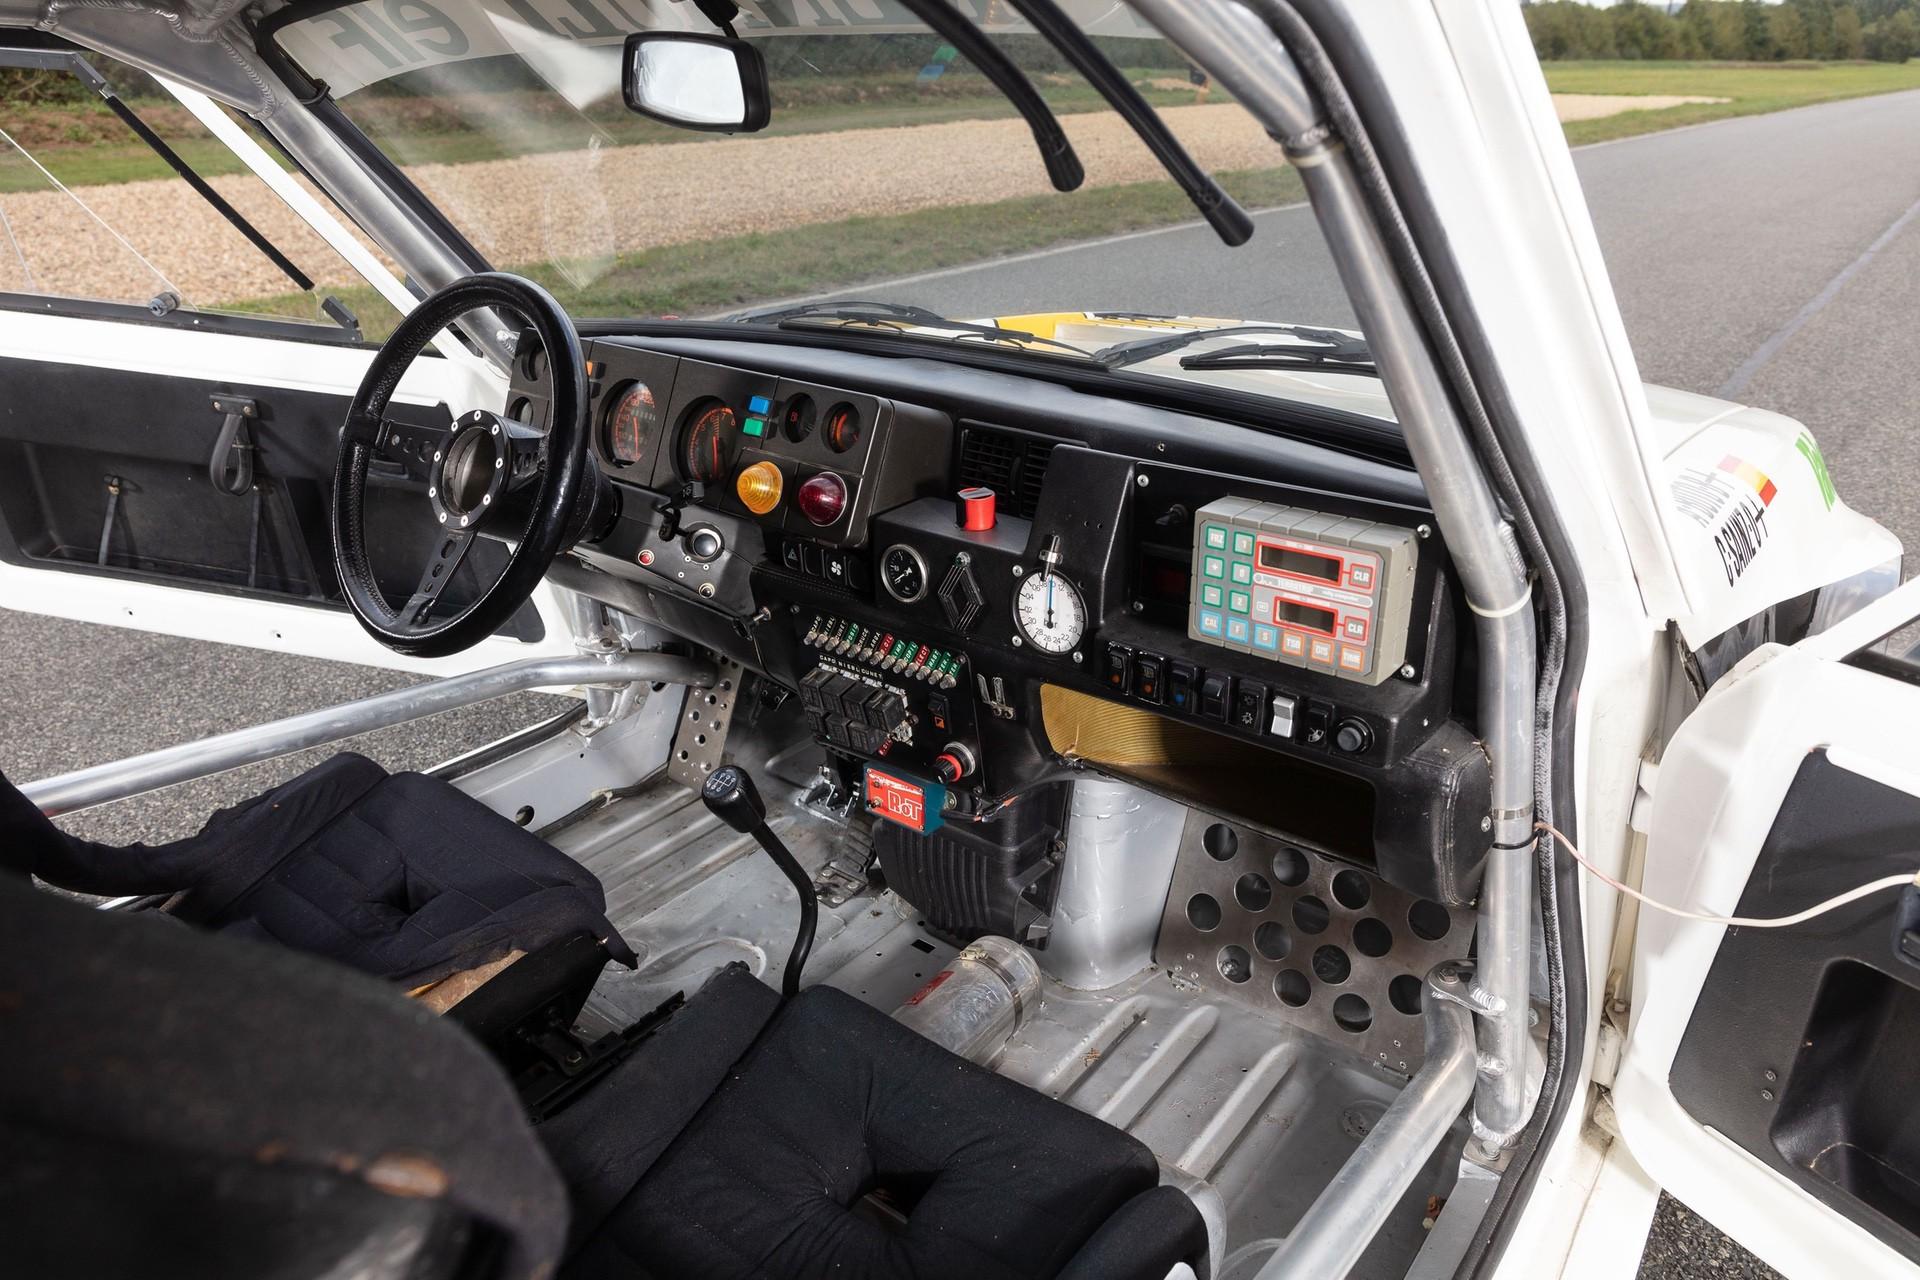 Renault_R5_Maxi_Turbo_ex-Carlos_Sainz-0018